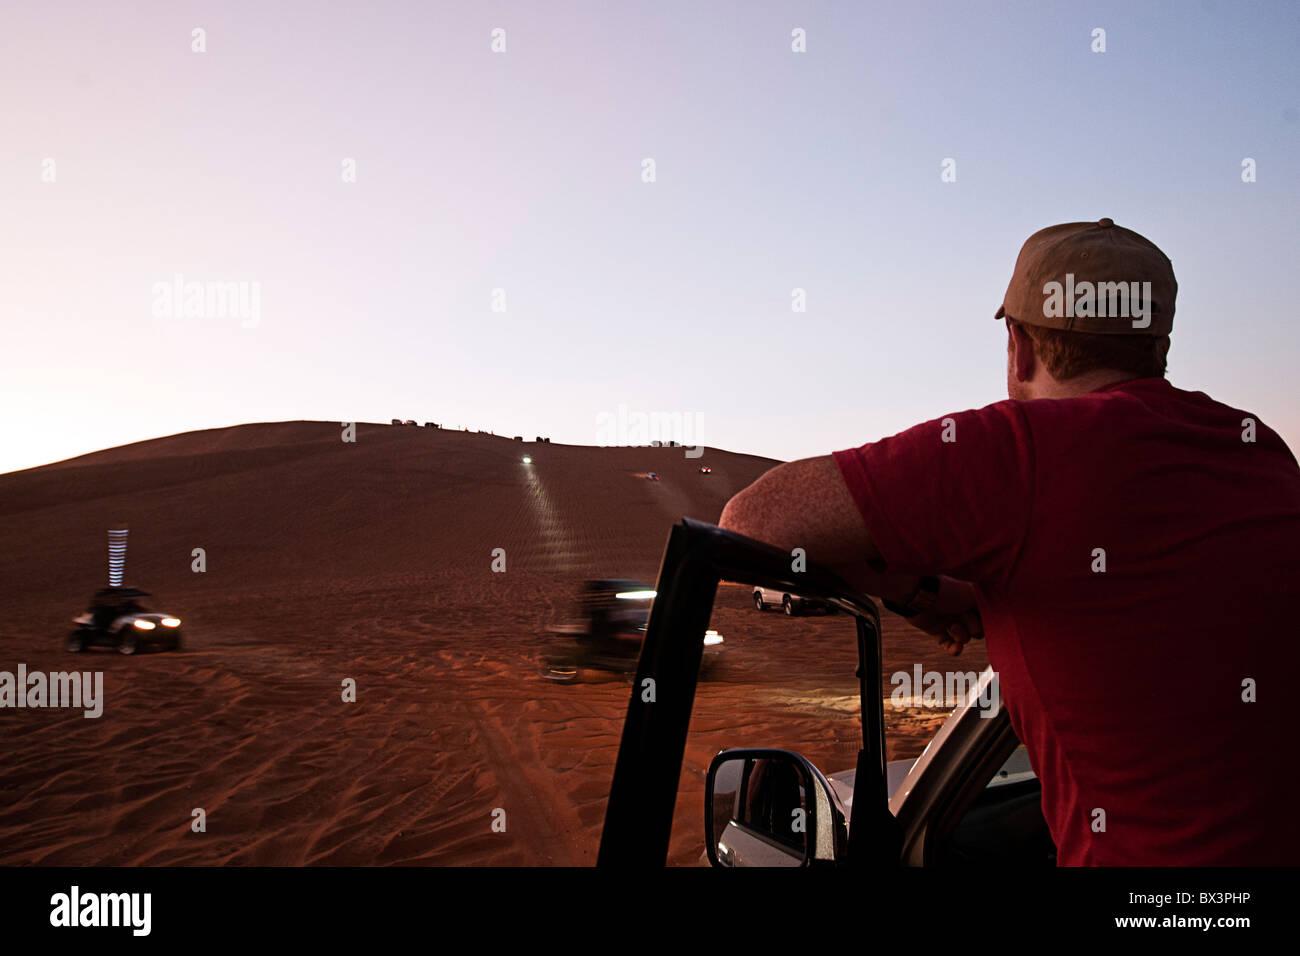 Man watching 4x4s on the Big Red sand dune in Dubai, UAE - Stock Image